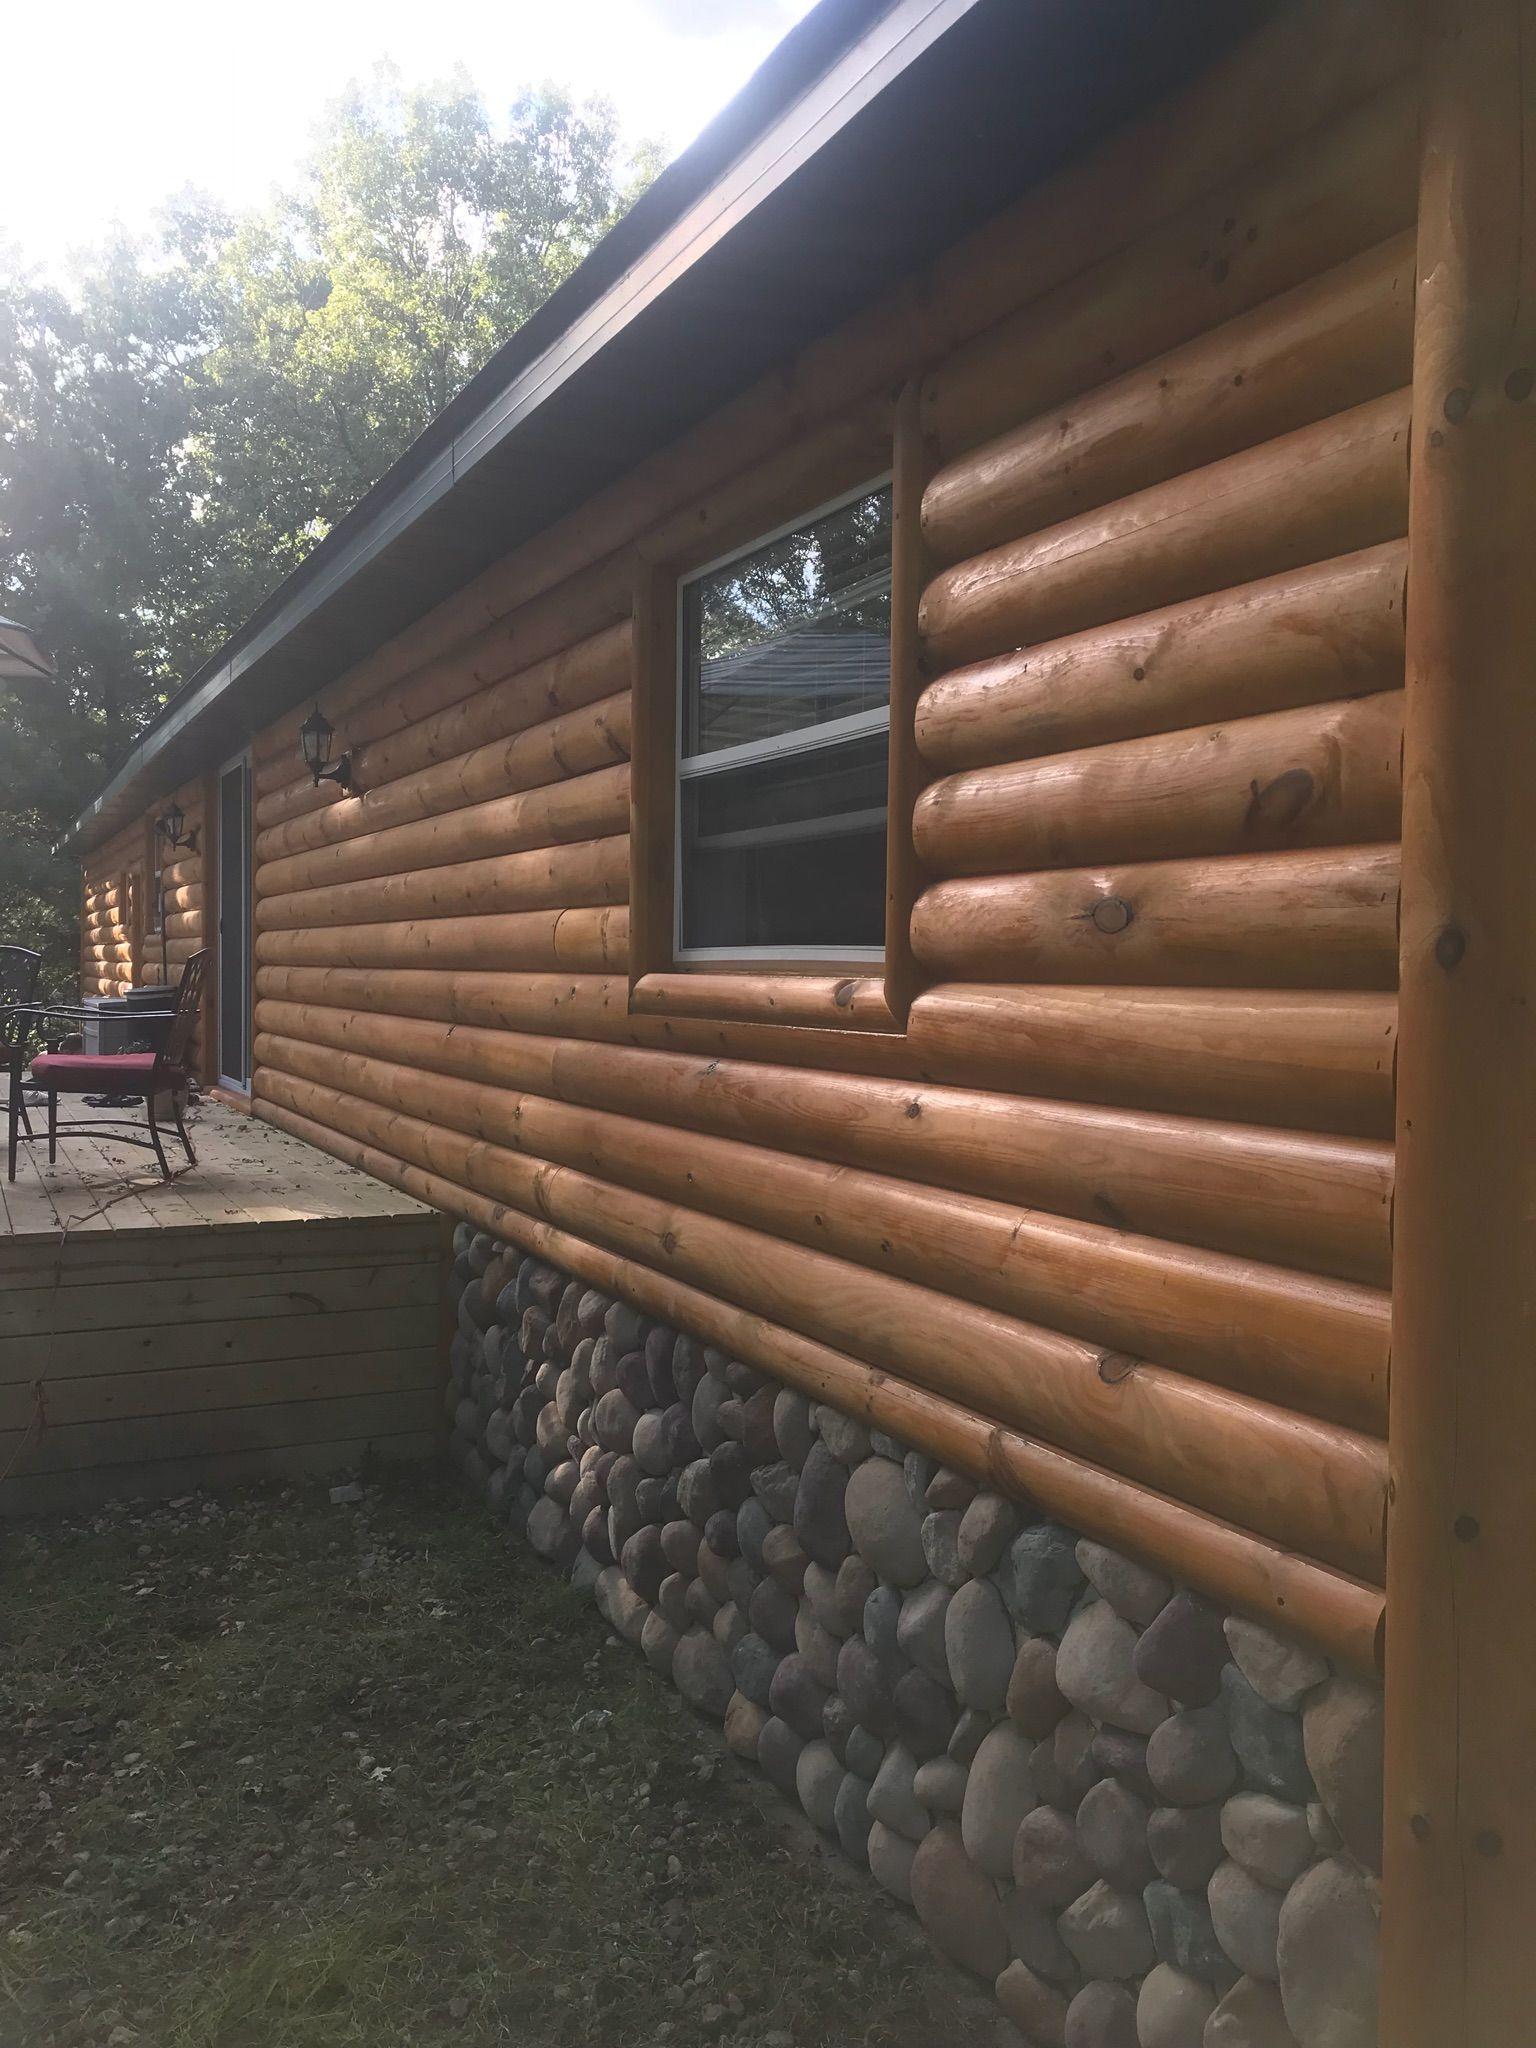 Log Siding For Mobile Homes Google Search Log Cabin Homes Log Siding Cabin Homes